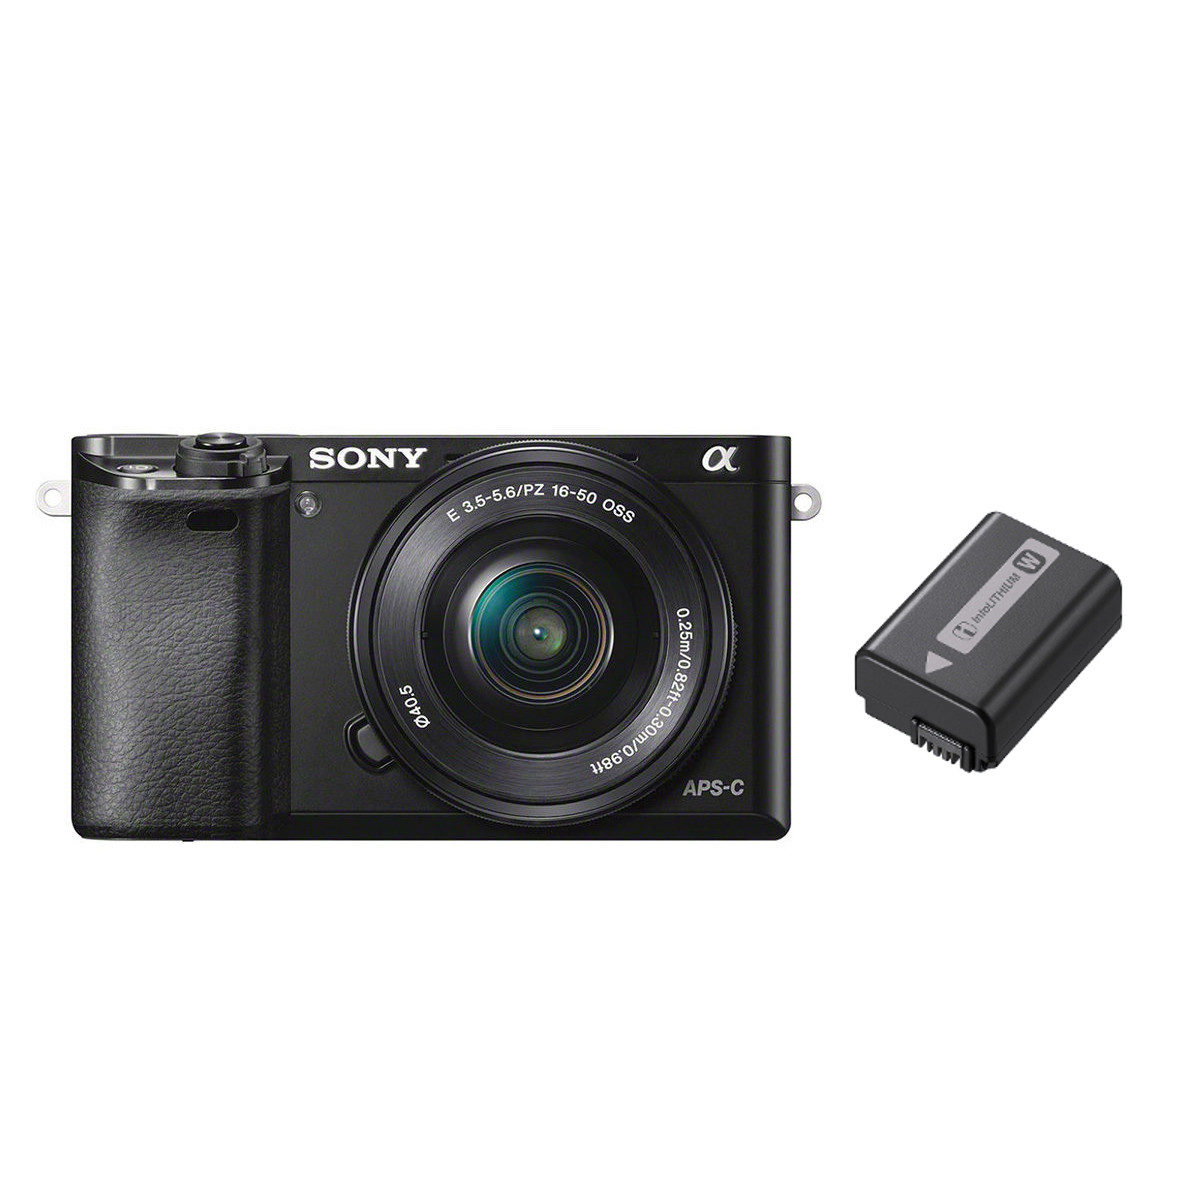 Sony Alpha A6000 ICL systeemcamera Zwart + 16-50mm OSS + extra accu <br/>€ 539.00 <br/> <a href='https://www.cameranu.nl/fotografie/?tt=12190_474631_241358_&r=https%3A%2F%2Fwww.cameranu.nl%2Fnl%2Fp2628085%2Fsony-alpha-a6000-icl-systeemcamera-zwart-16-50mm-oss-extra-accu%3Fchannable%3De10841.MjYyODA4NQ%26utm_campaign%3D%26utm_content%3DSony%2Bsysteemcamera%26utm_source%3DTradetracker%26utm_medium%3Dcpc%26utm_term%3DDigitale%2Bcamera%26apos%3Bs' target='_blank'>naar de winkel</a>